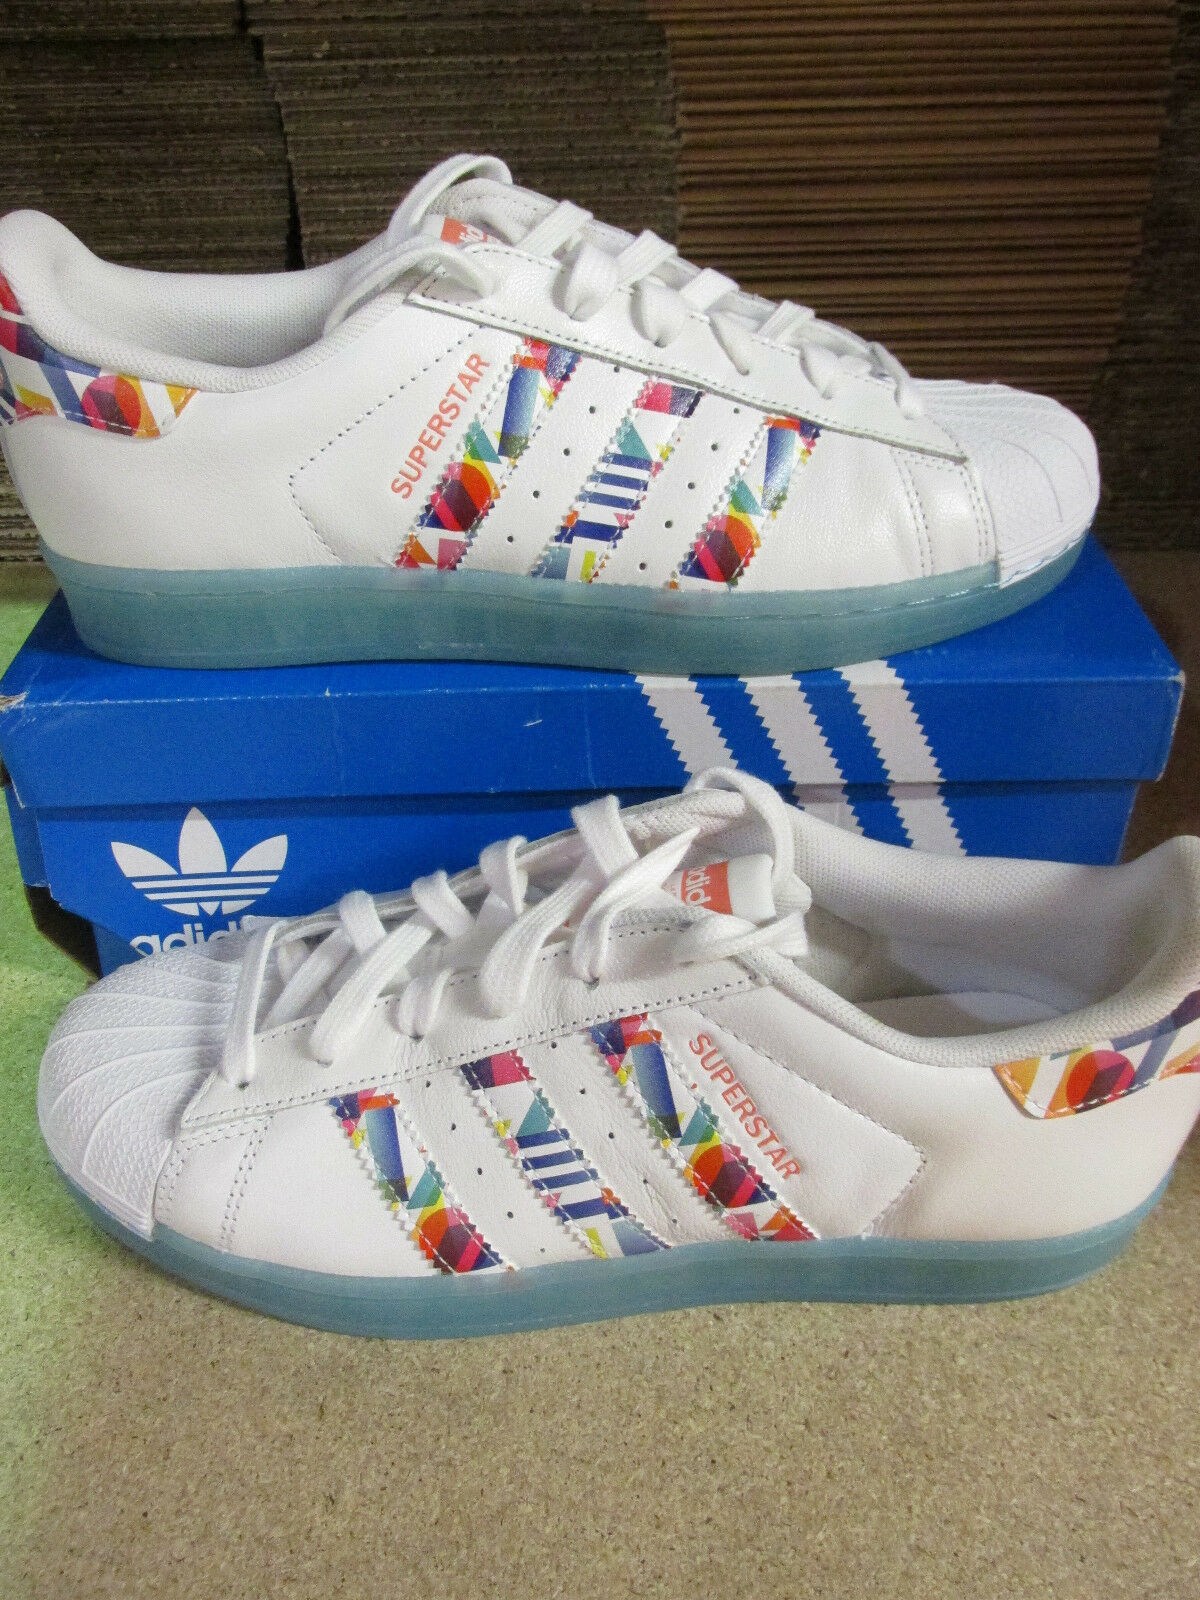 Adidas Originaux Superstar BB4308 Baskets pour Femme Baskets